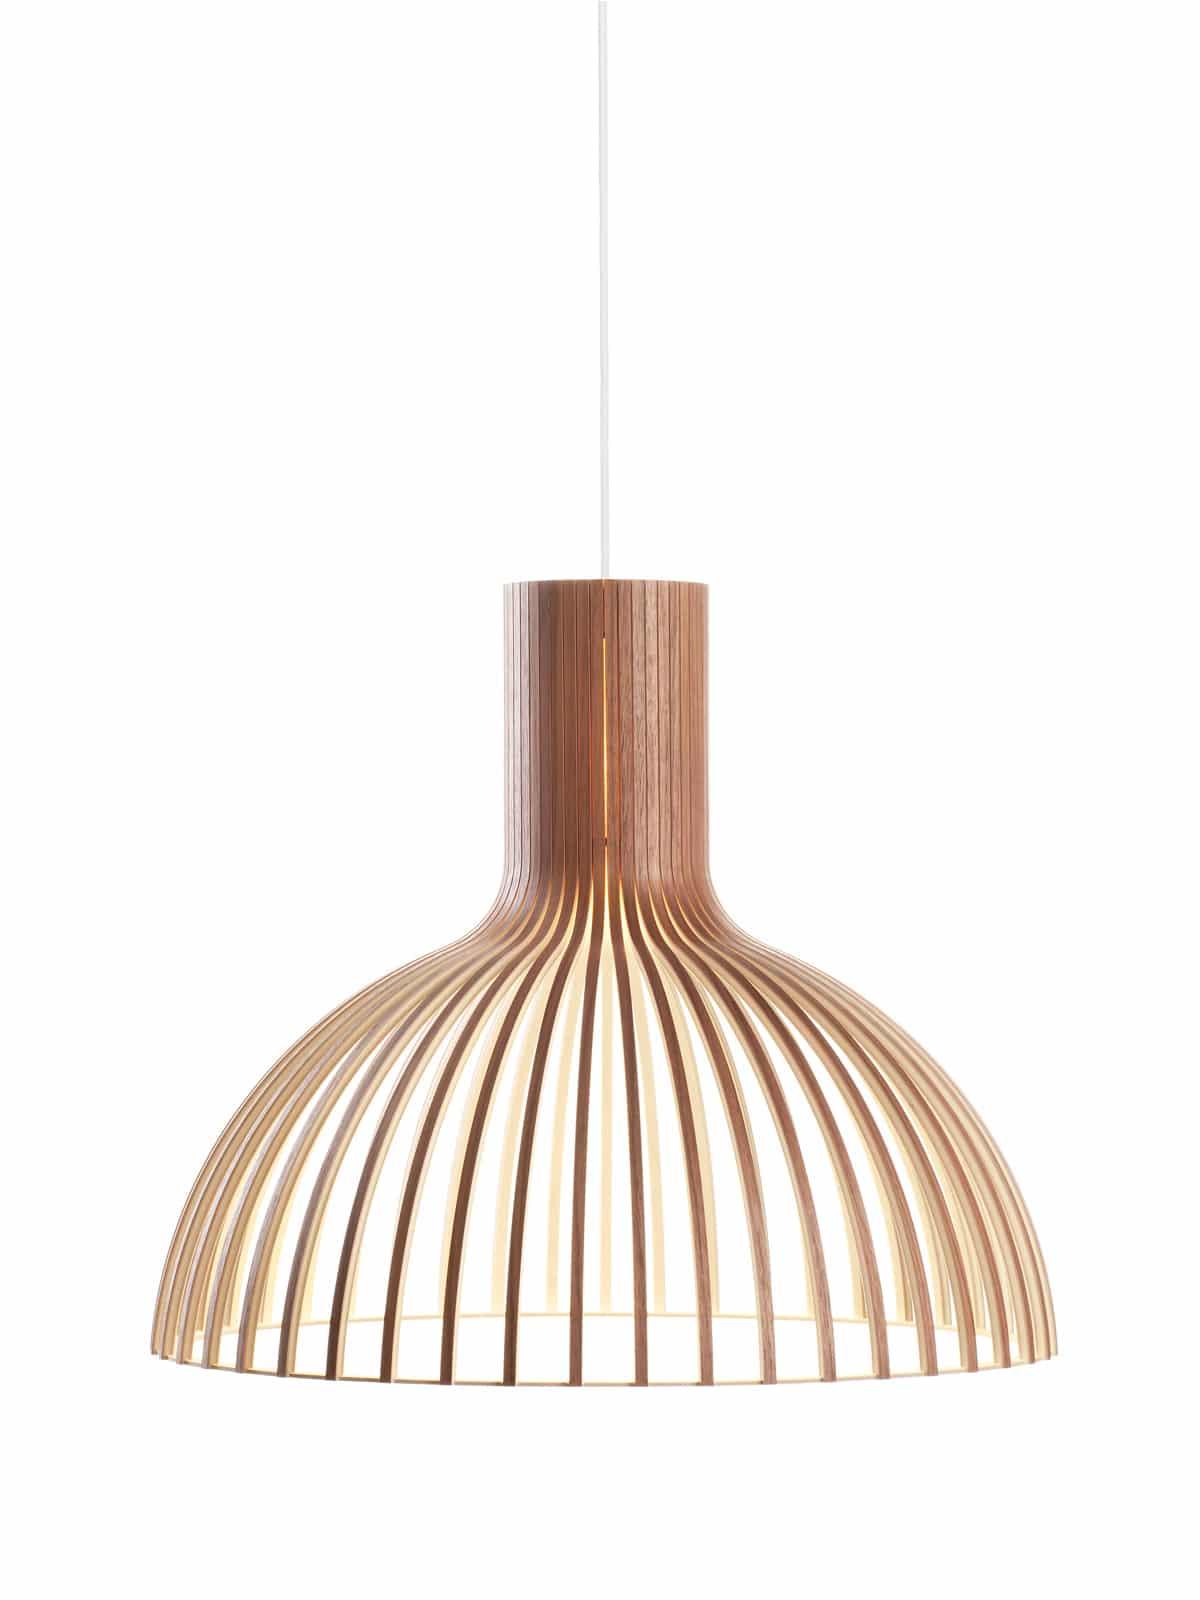 Secto Victo 4250 Holzleuchte DesignOrt Onlineshop Lampen Berlin